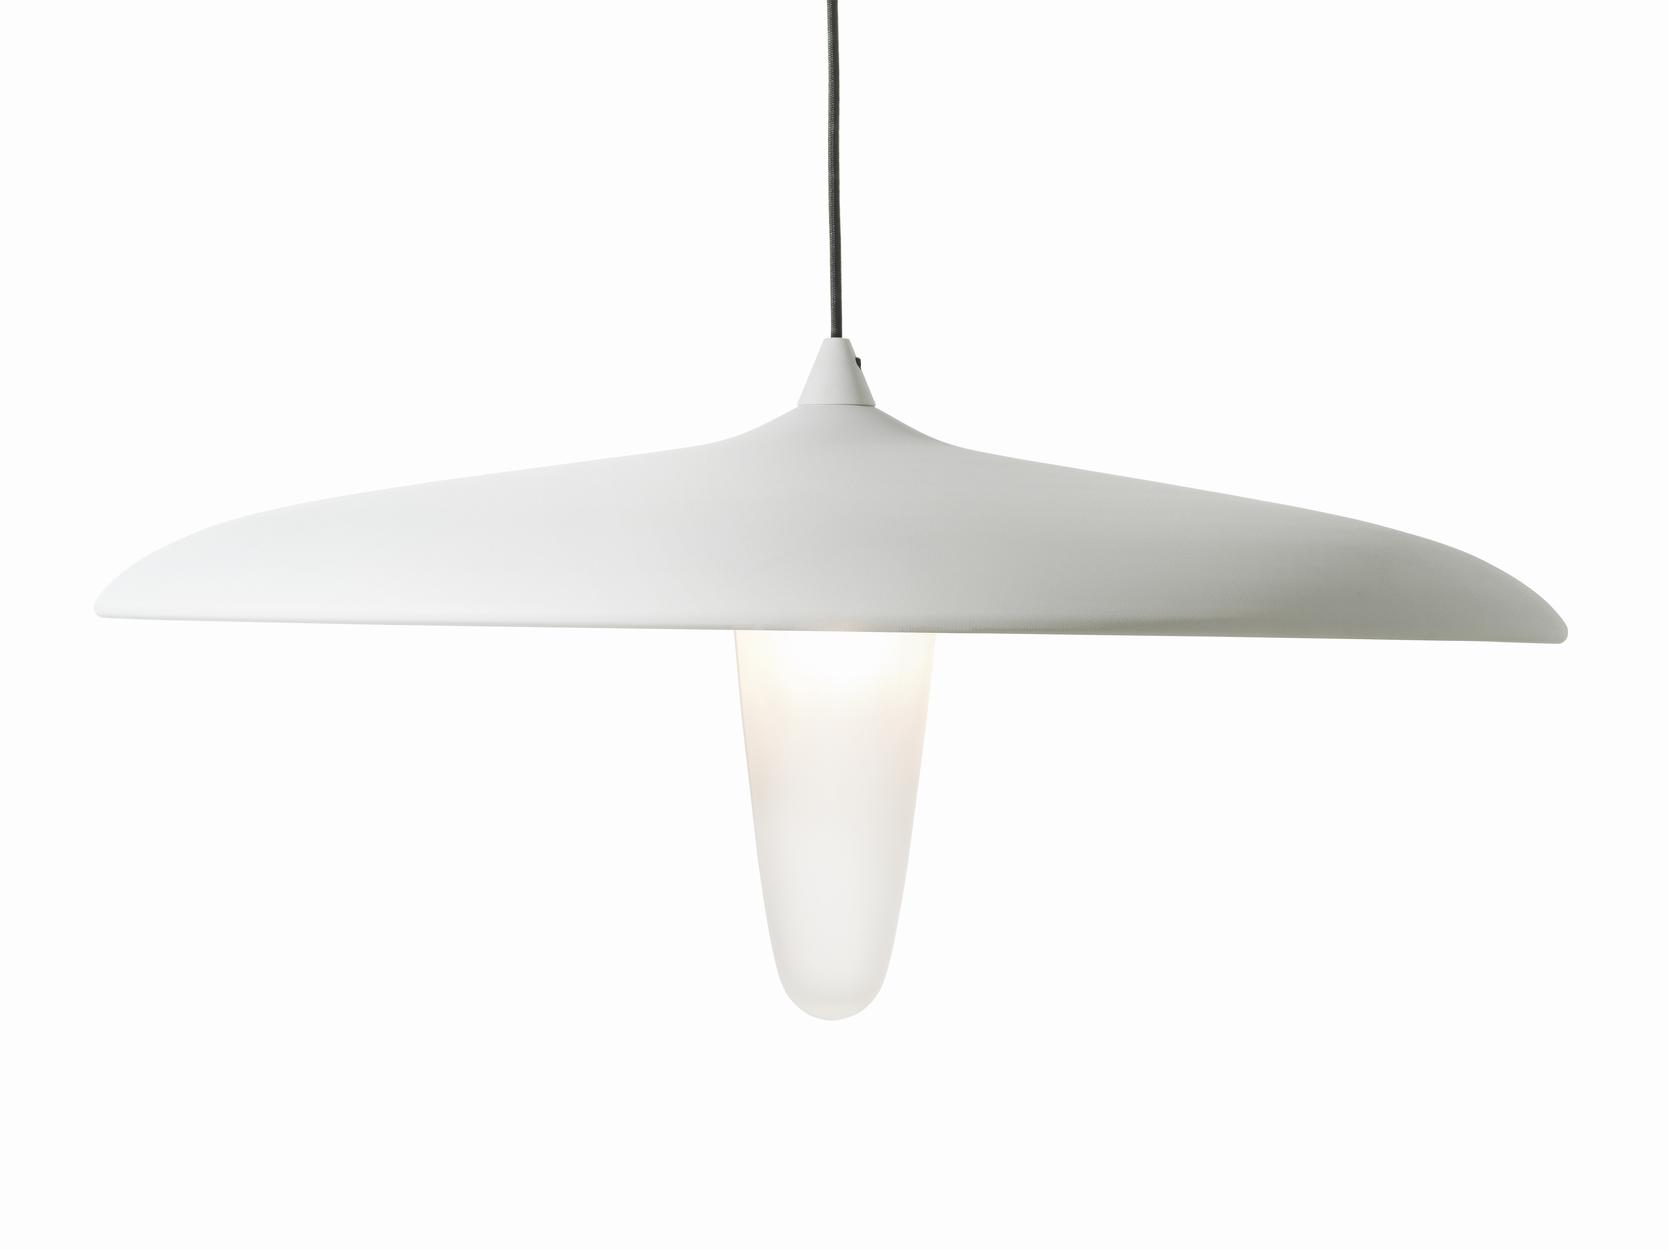 Bertjan Pot Functionals Hanglamp Aron 701 Strak Minimalisme Gimmii